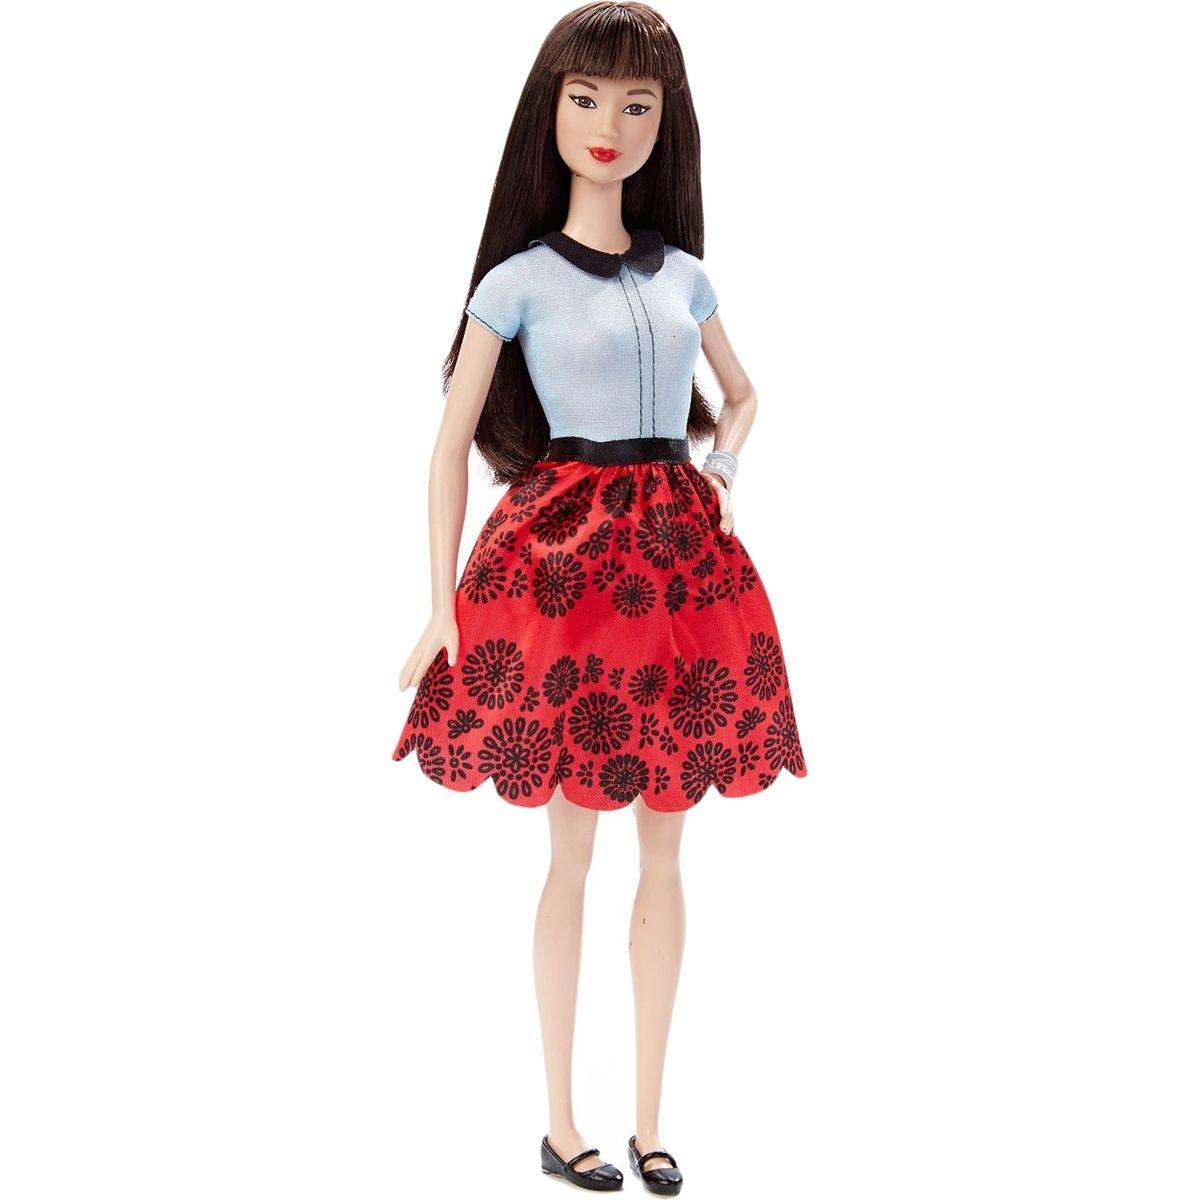 Barbie Modelka - DGY61